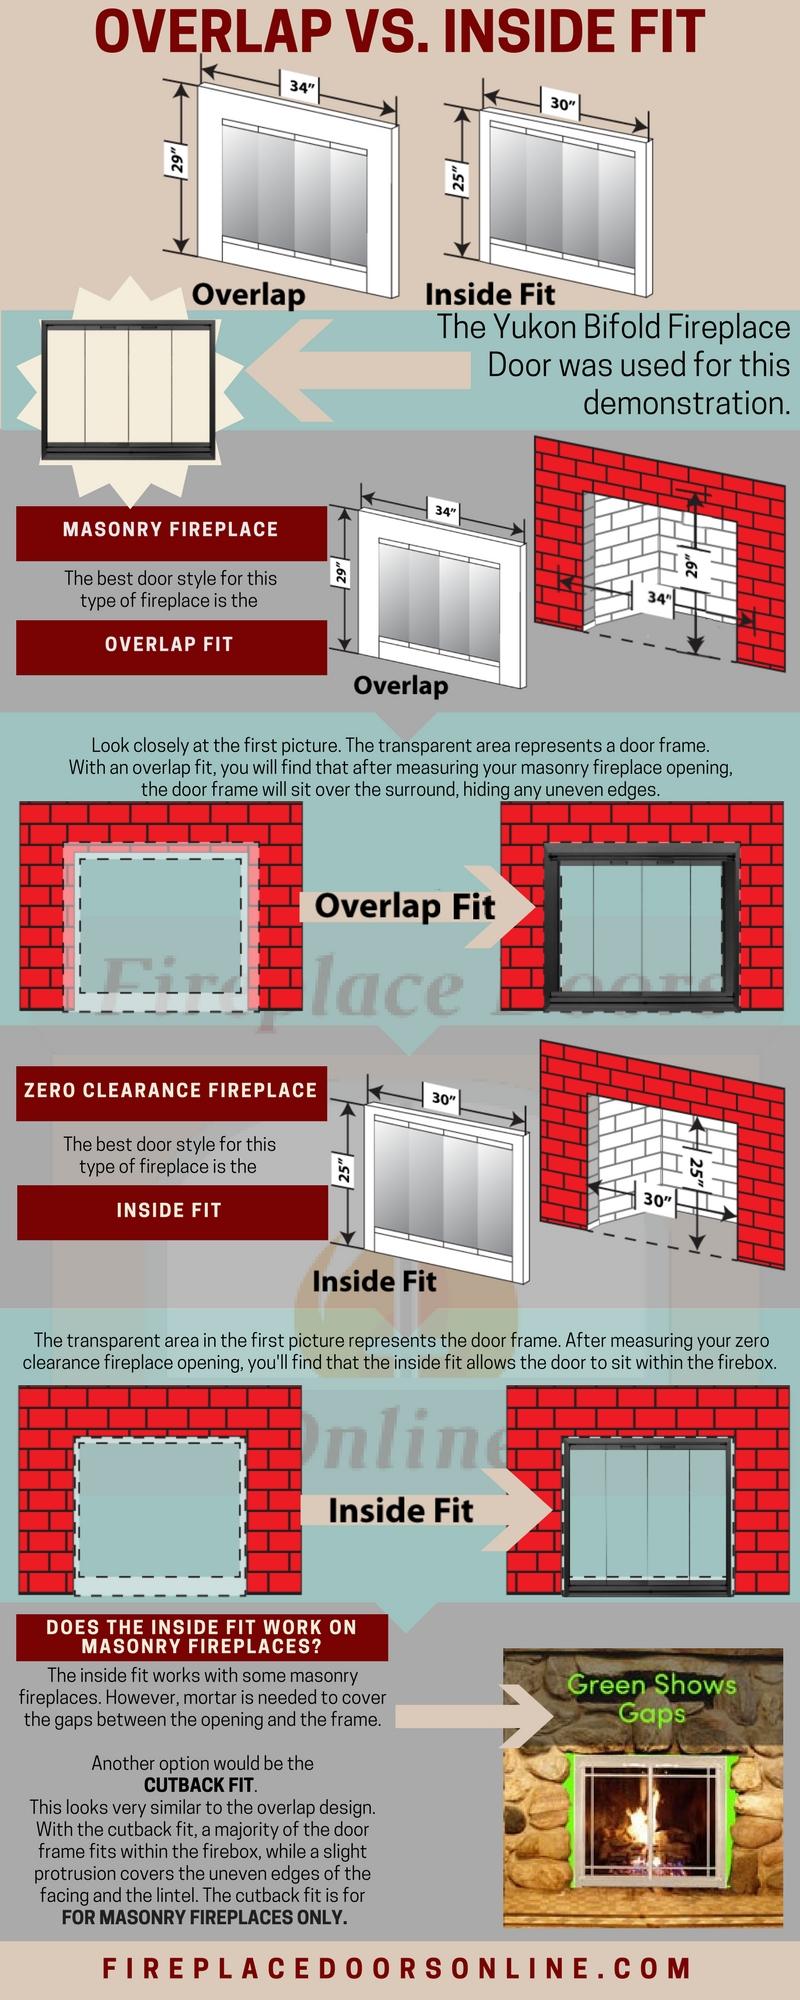 Fireplace Door Fit Infographic